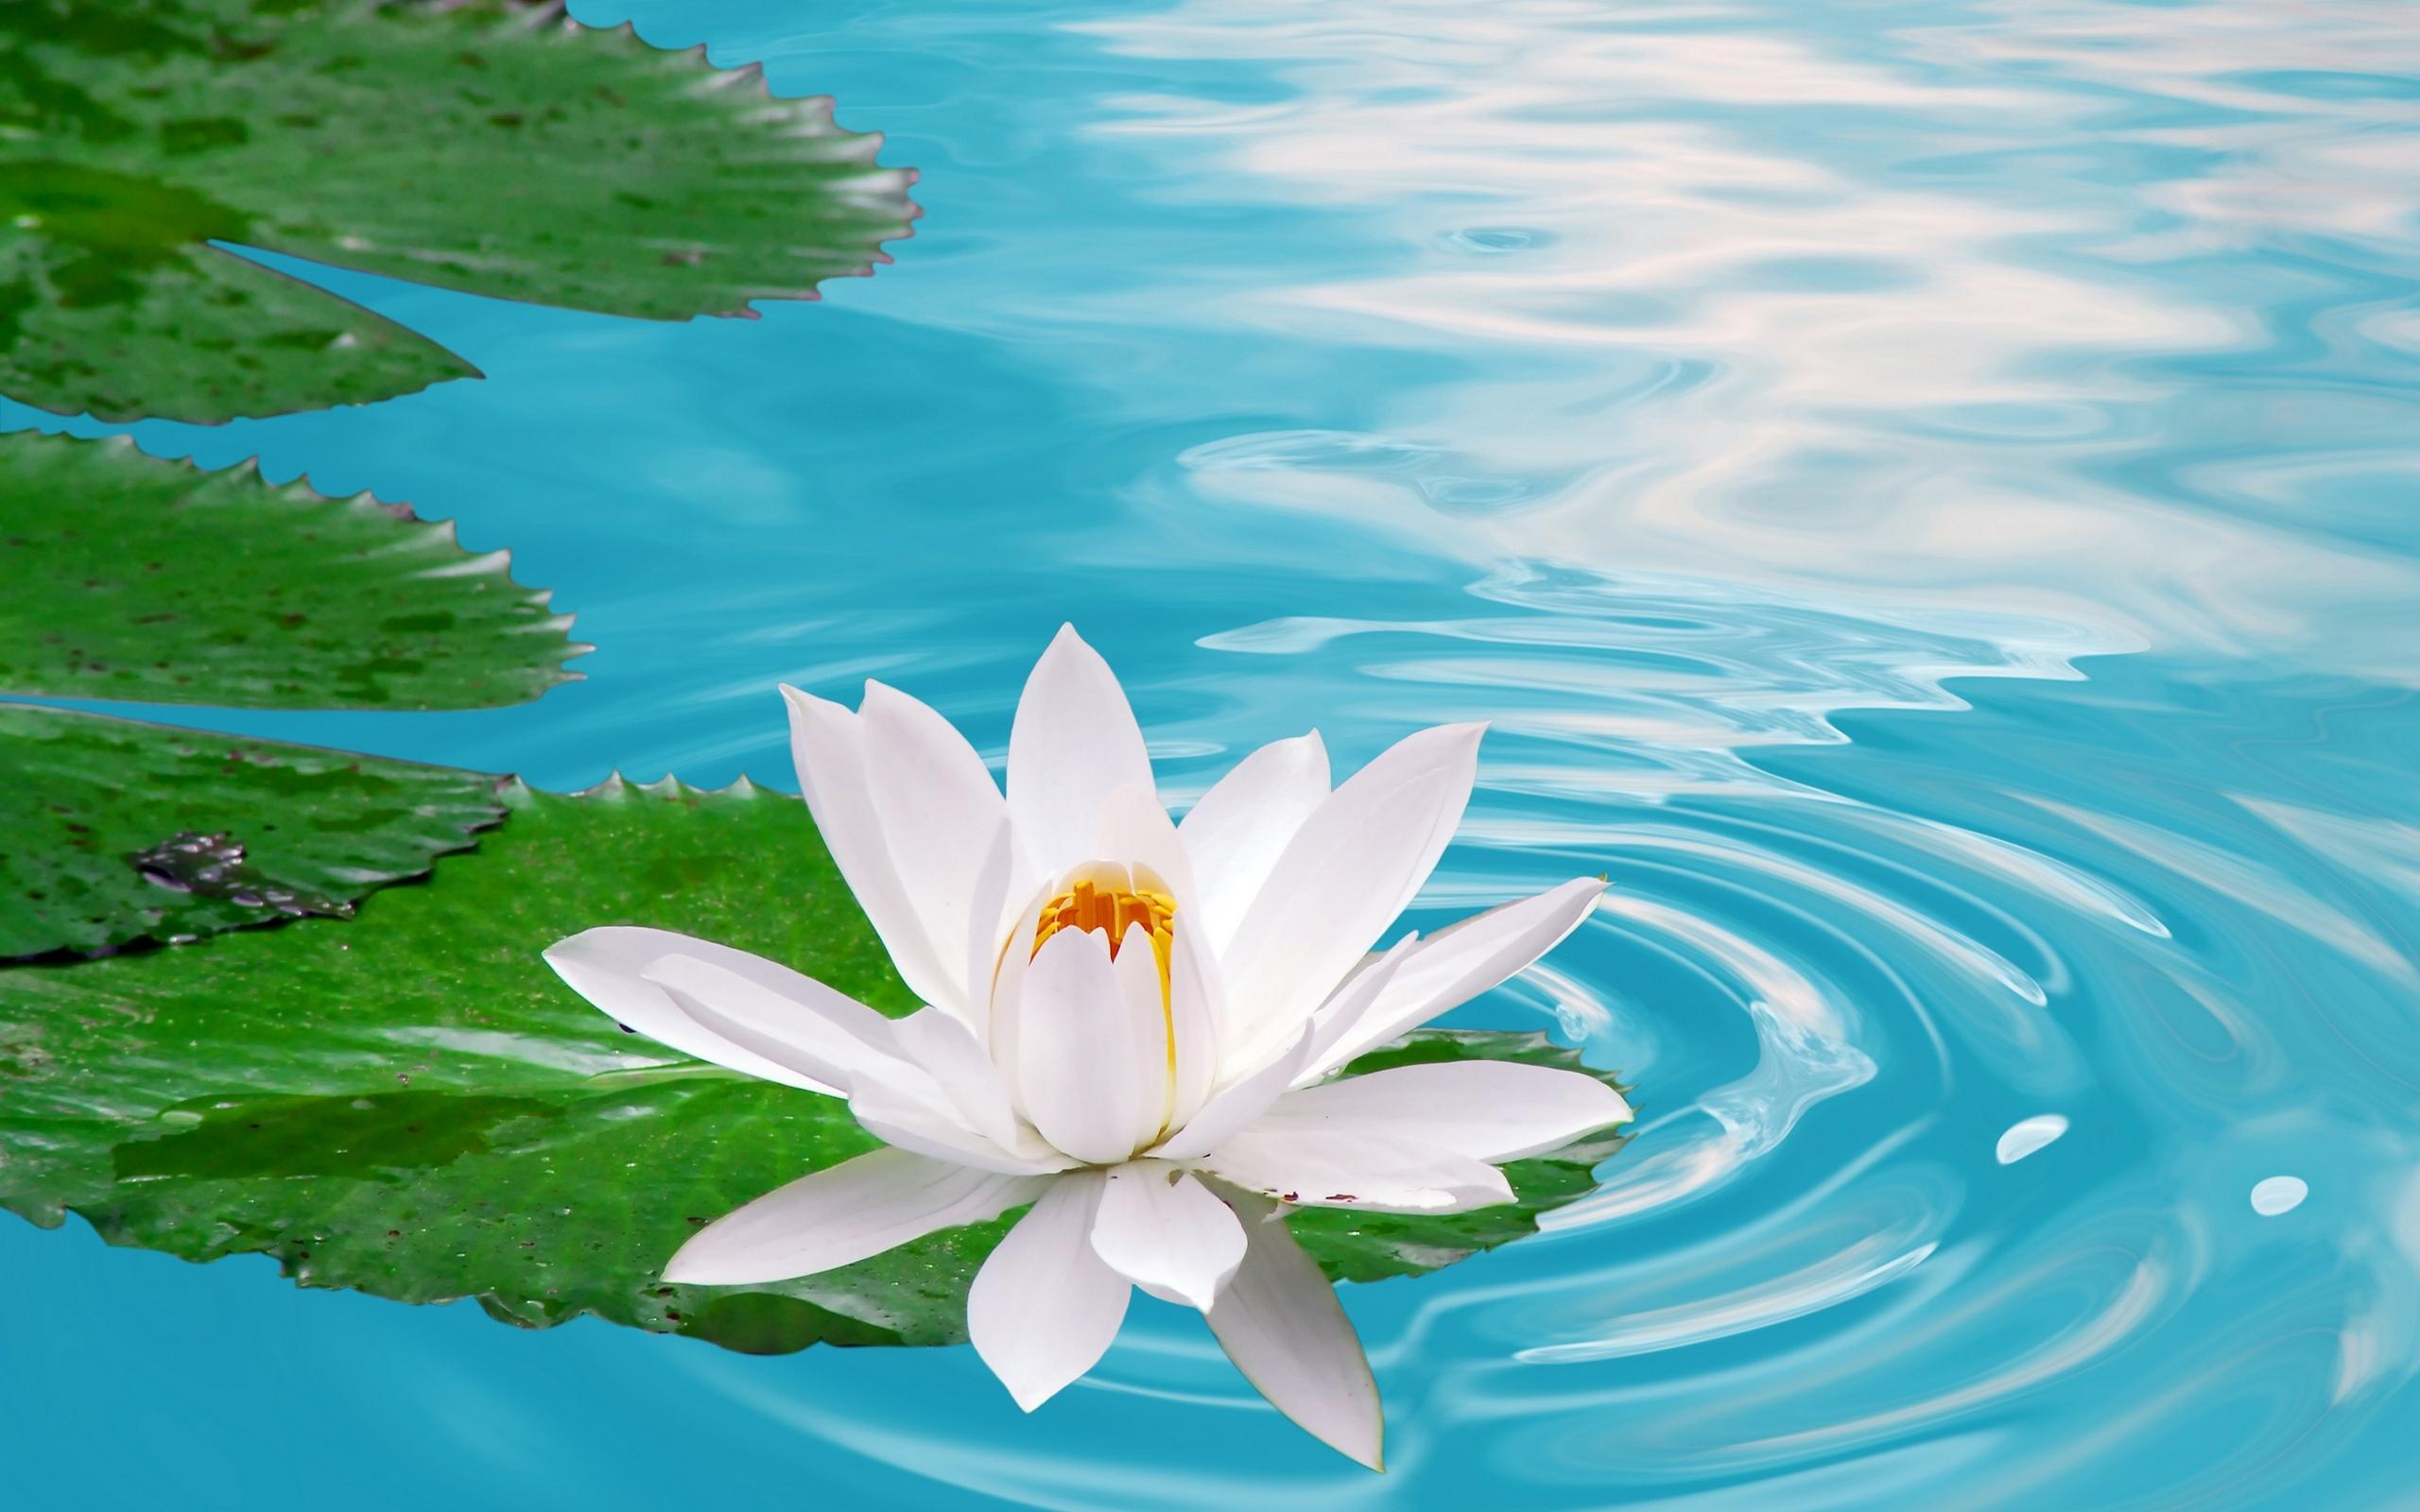 Download Lotus Flowers Wallpaper Hd Freetopwallpapercom 2560x1600